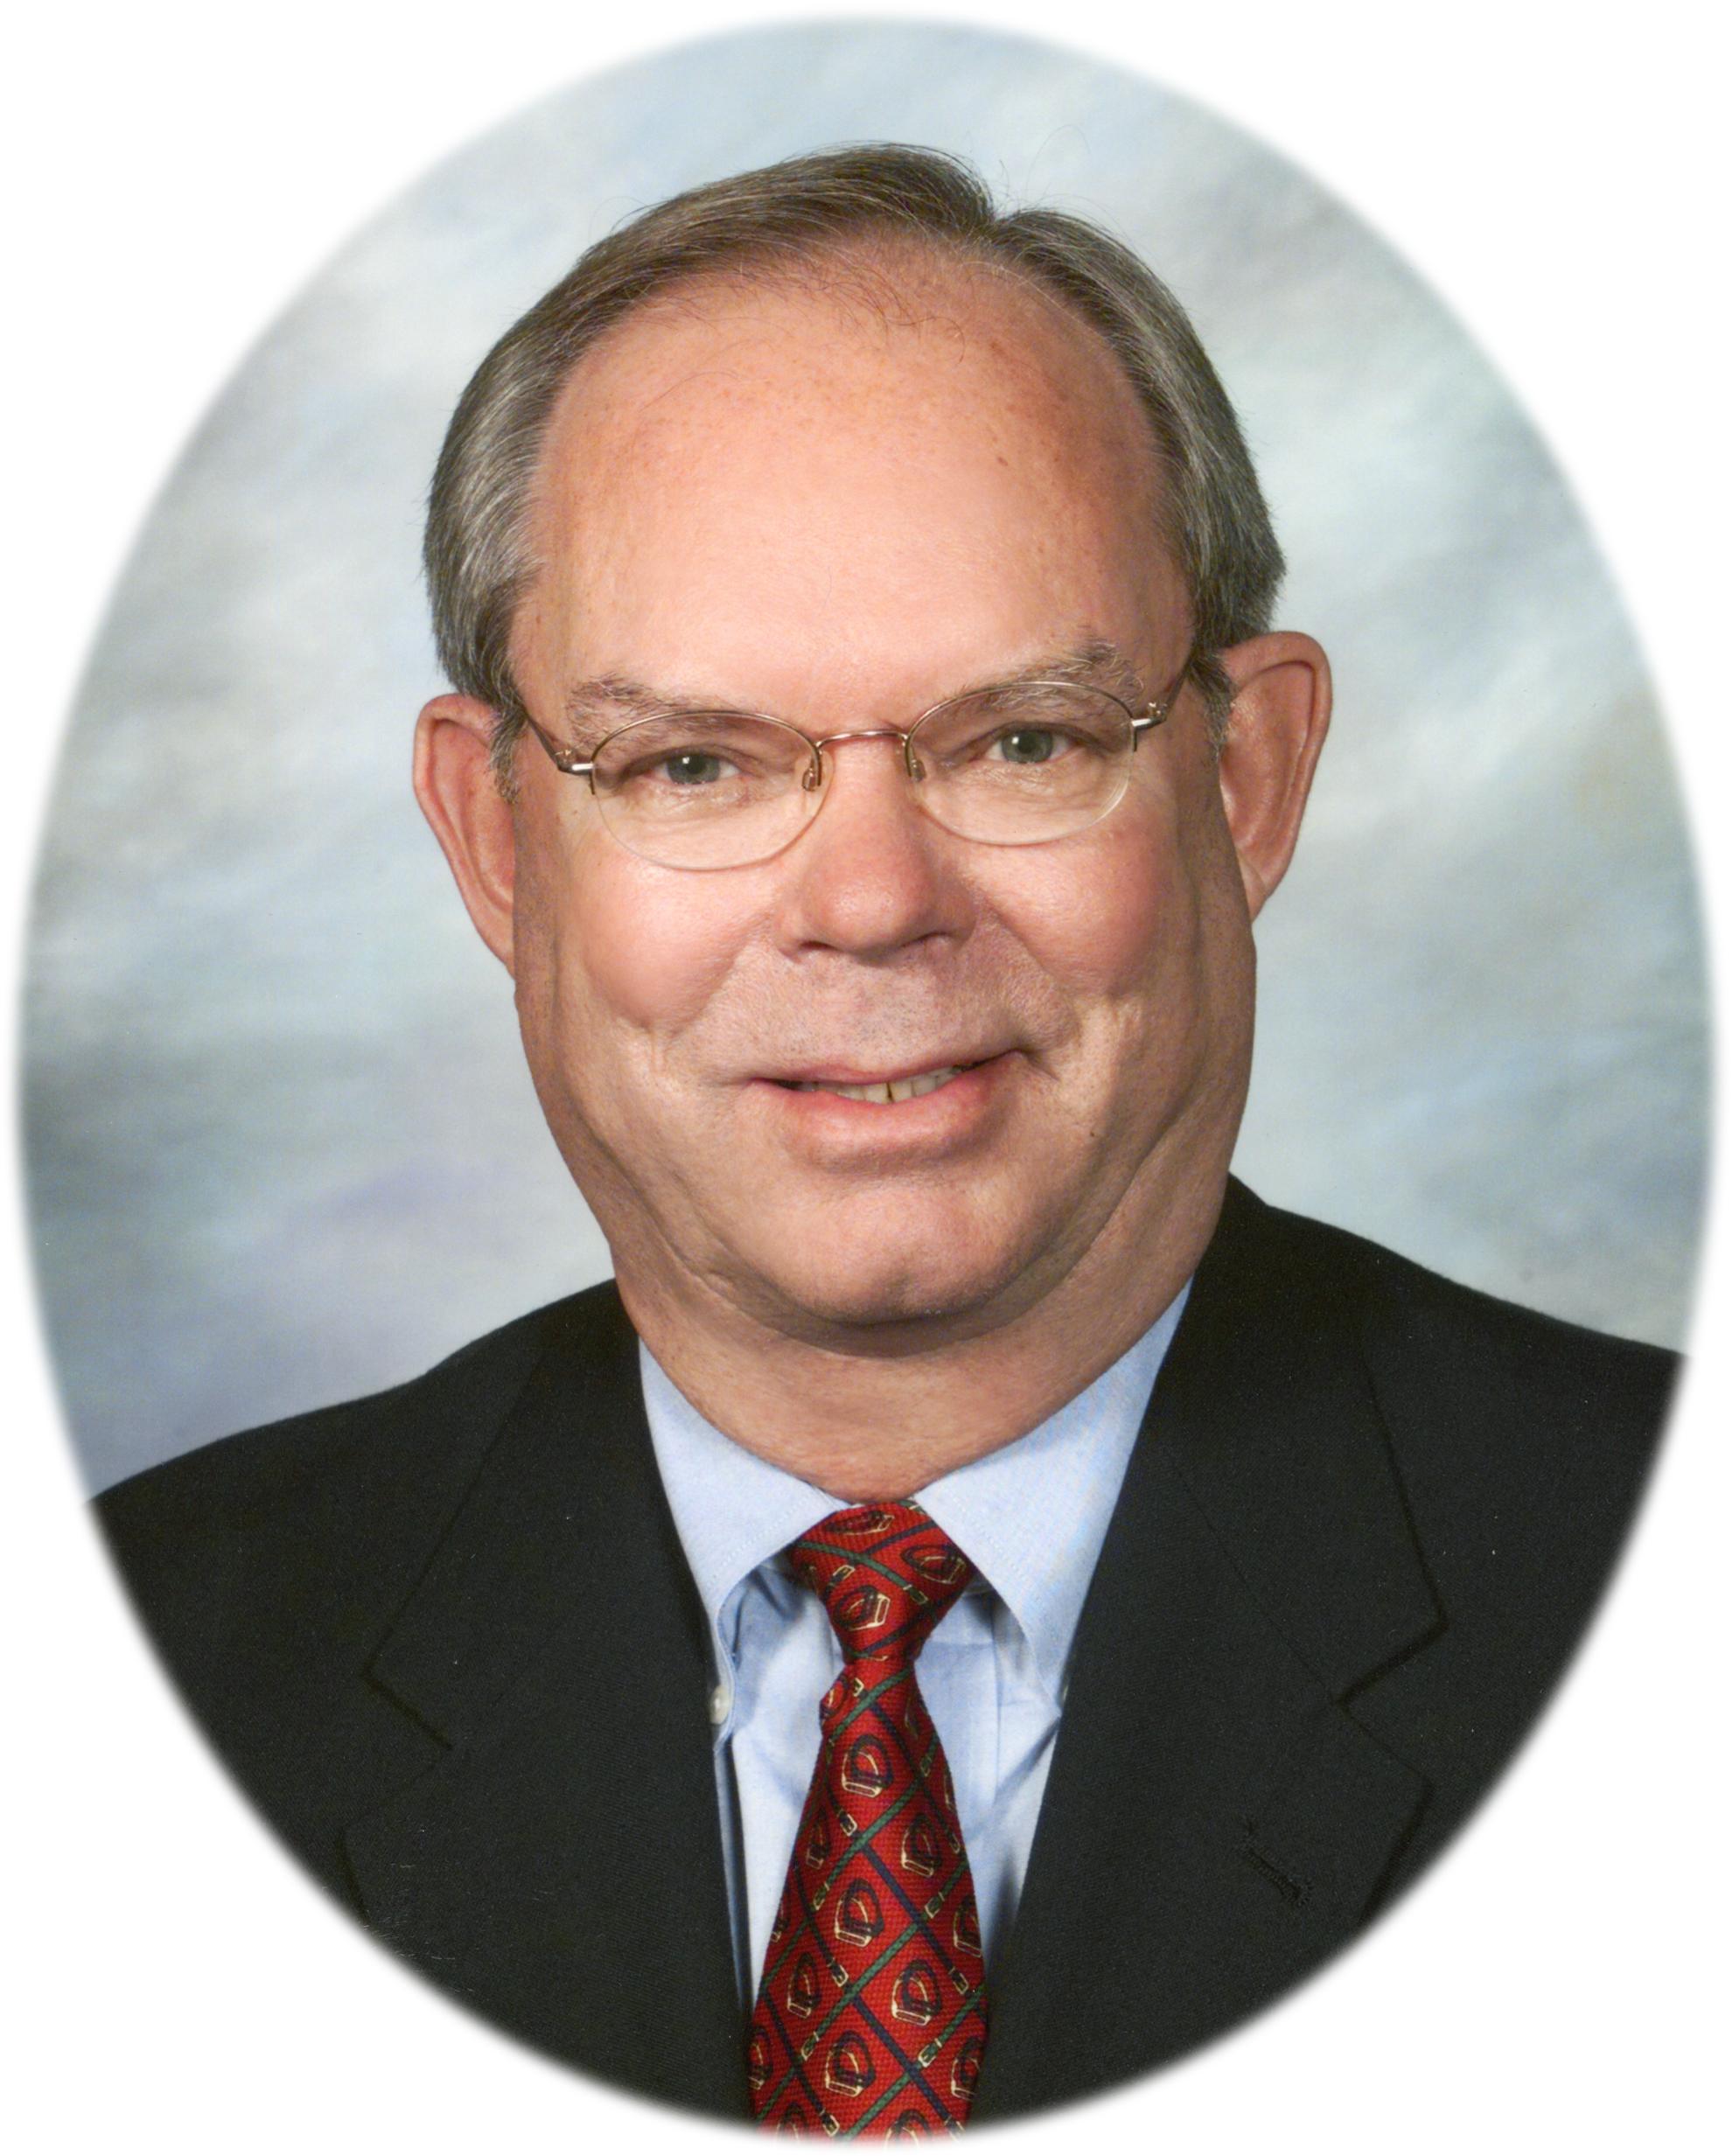 Donald Dean Bienhoff